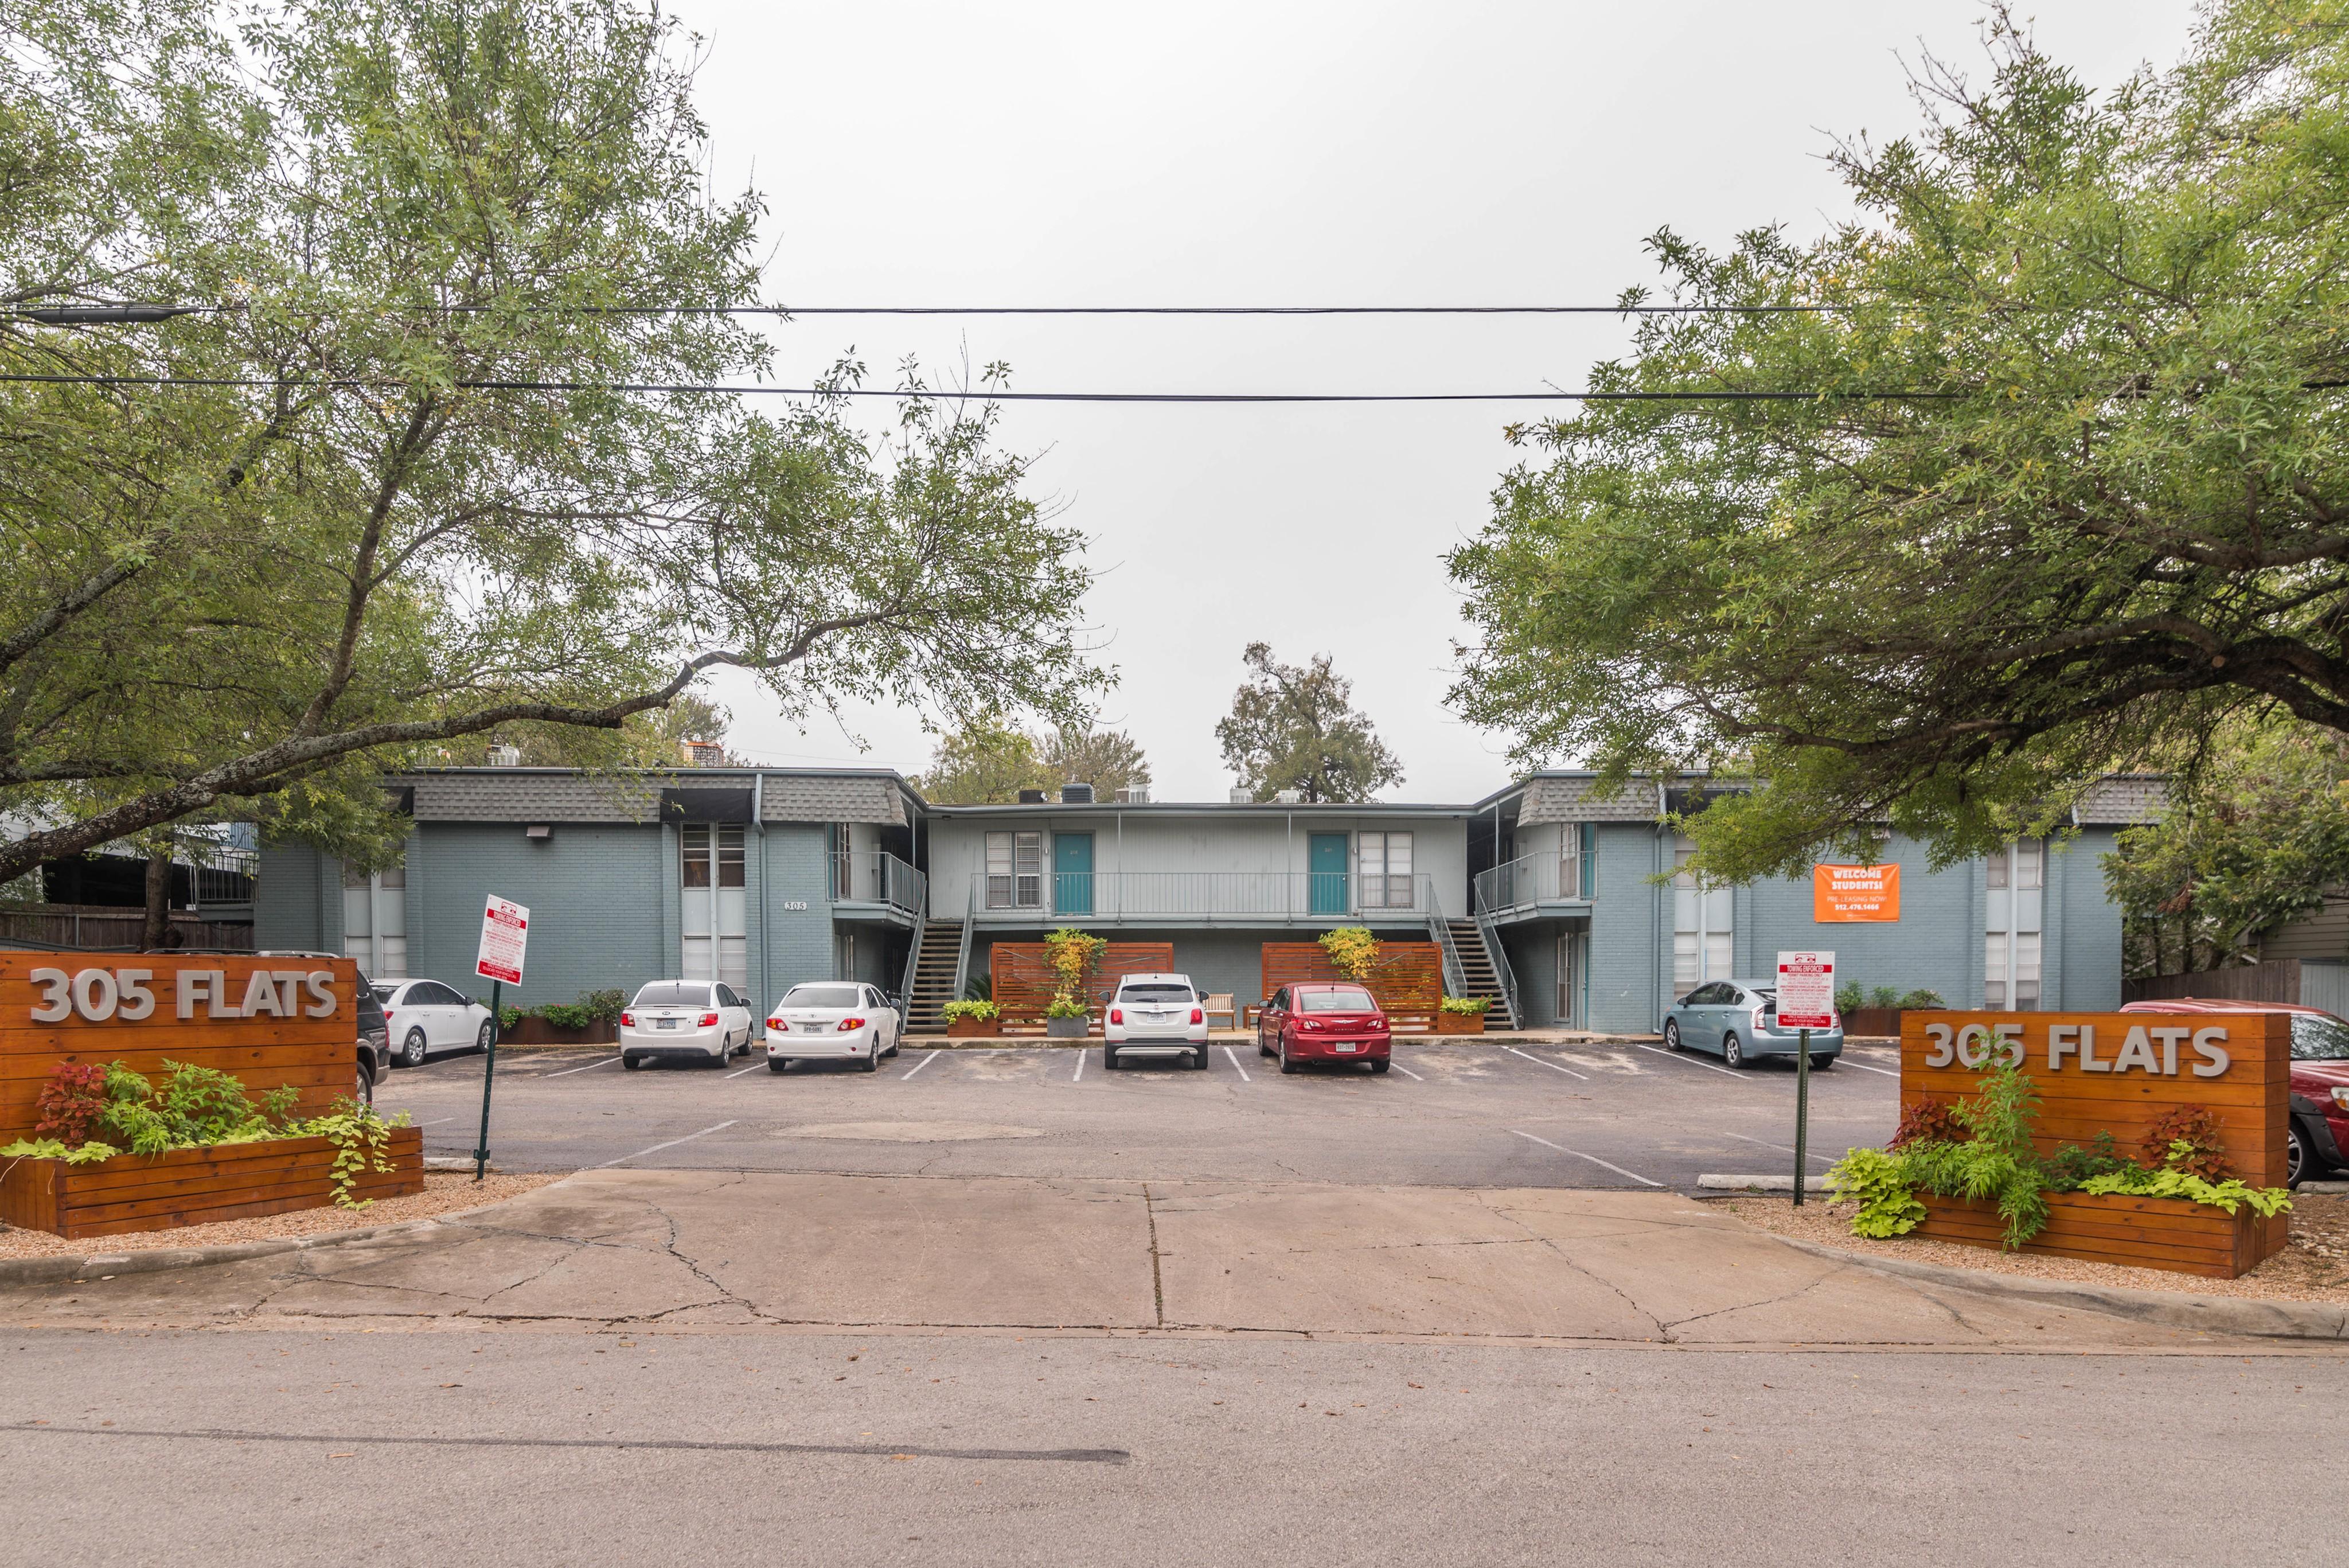 Apartments Near UT Austin 305 Flats for University of Texas - Austin Students in Austin, TX